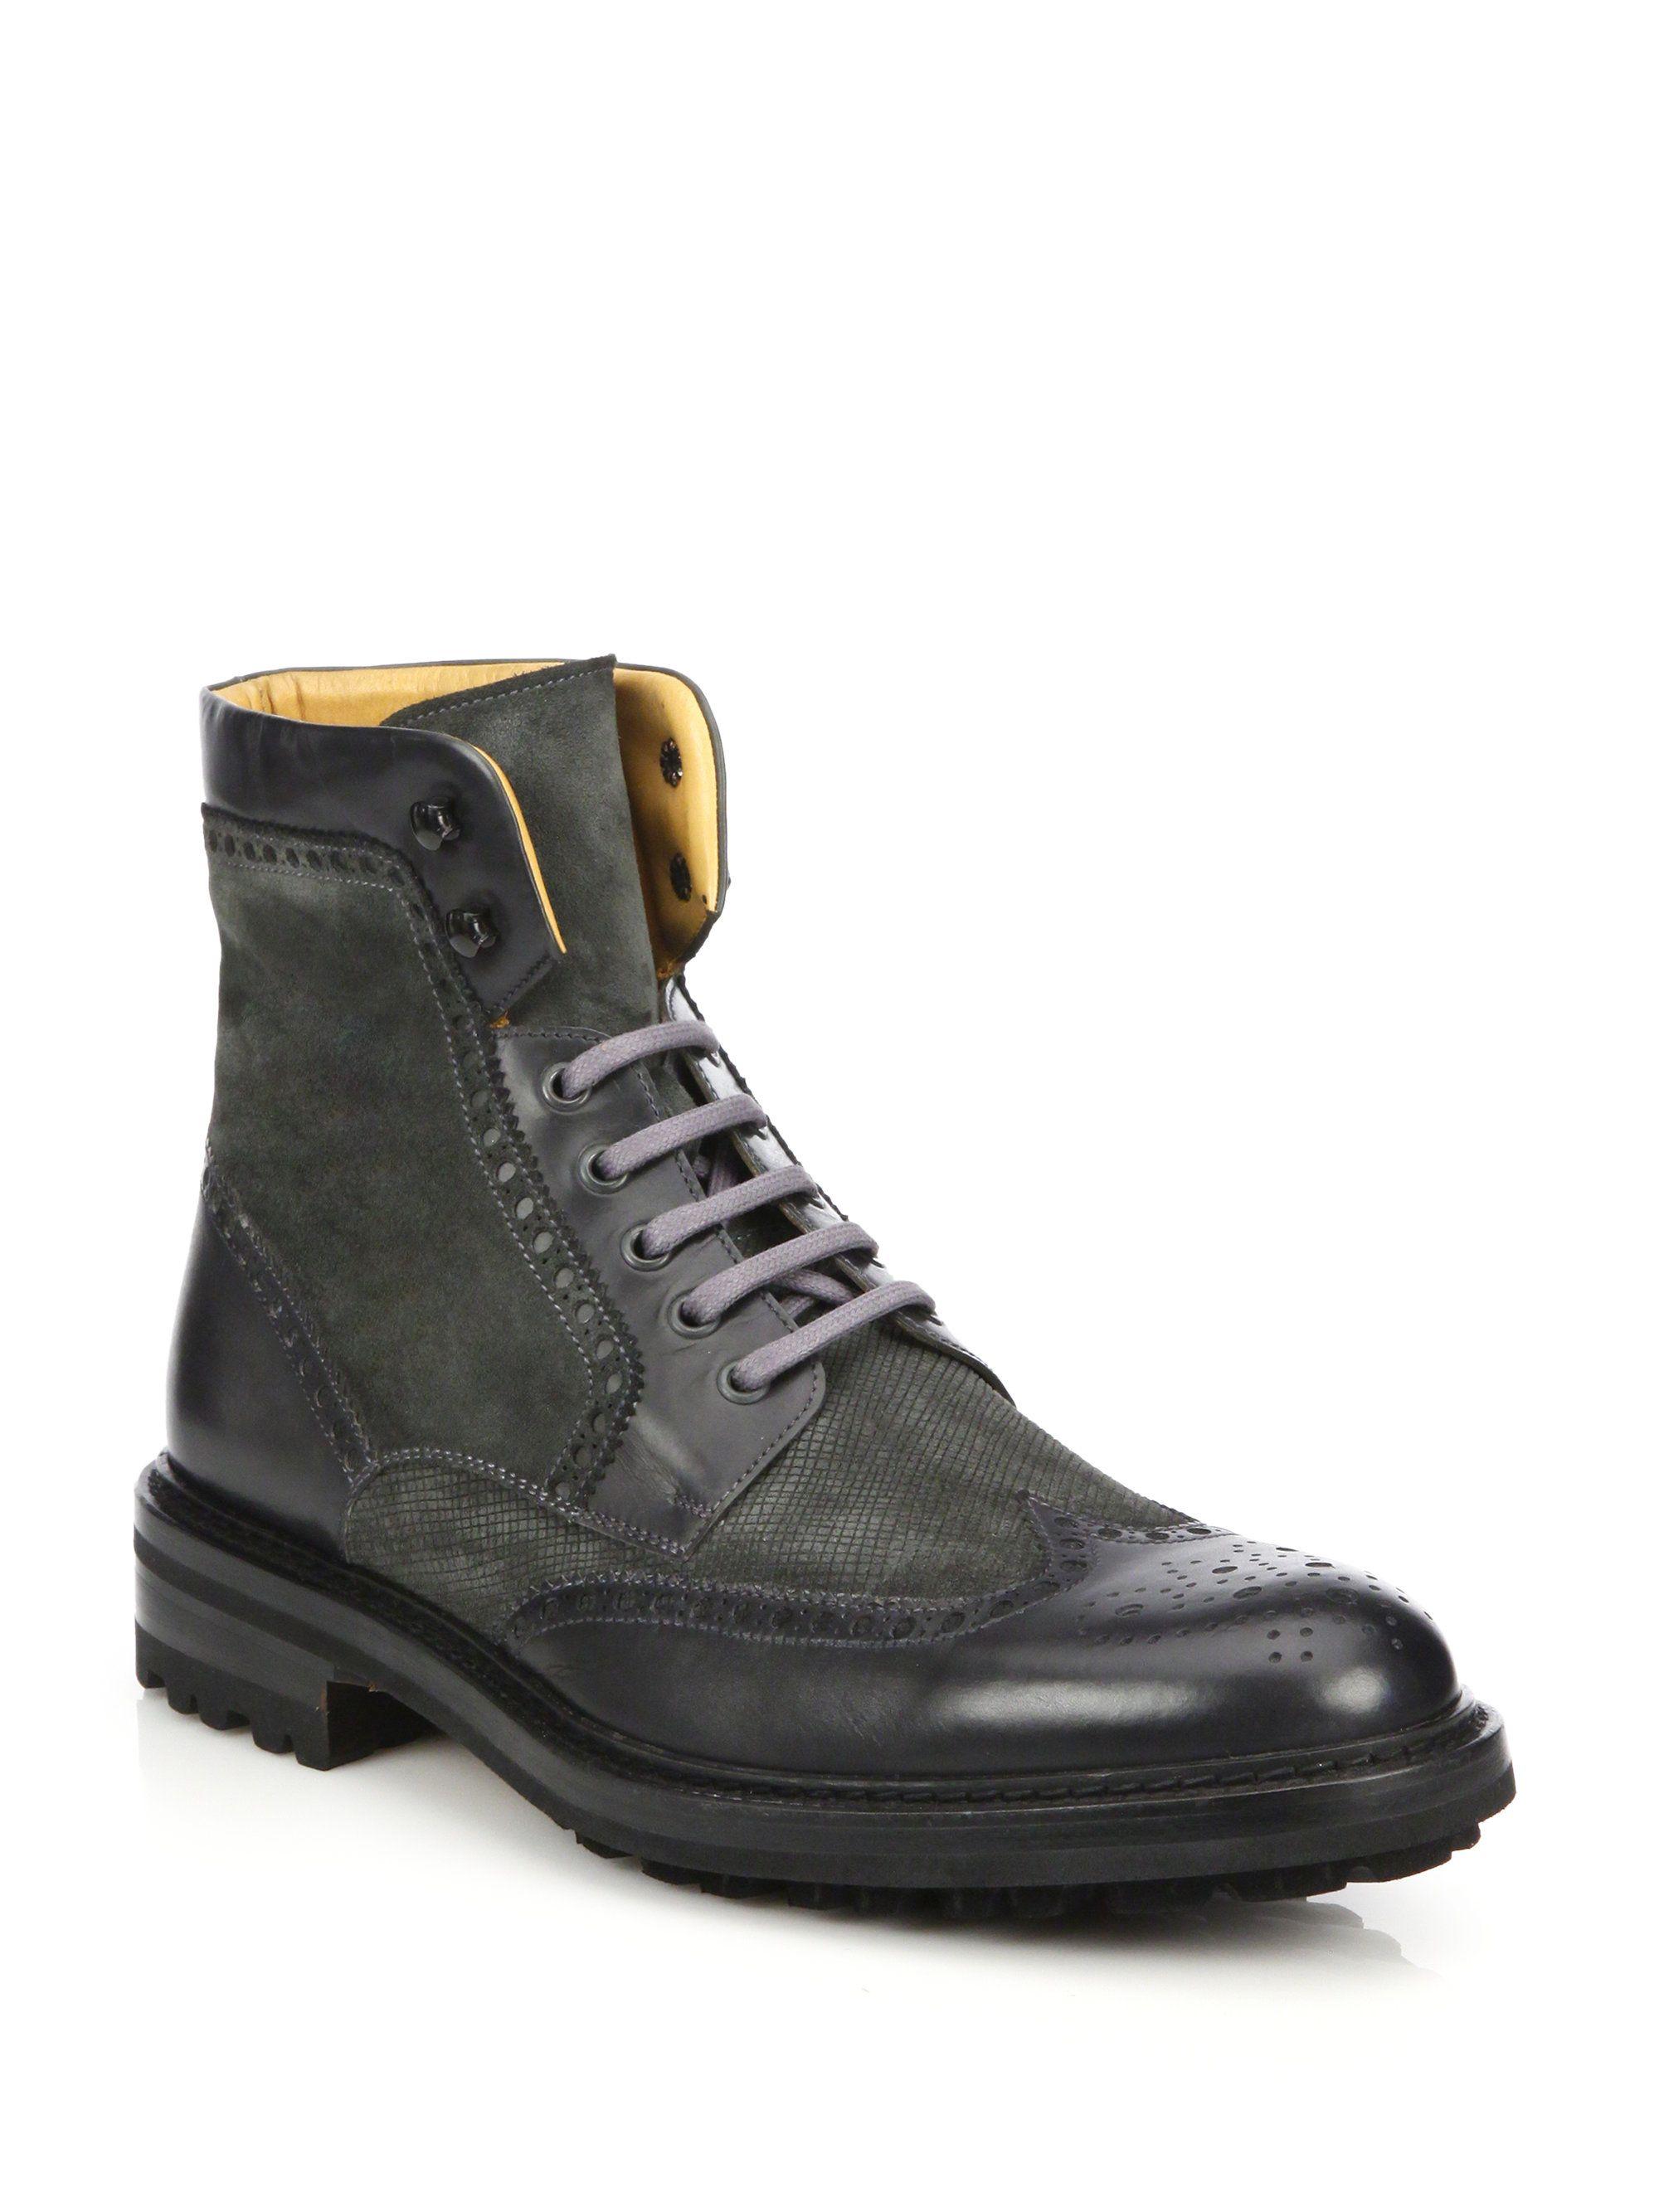 Saks Fifth AvenueCOLLECTION Wingtip Suede Combat Boots XNWHyT4